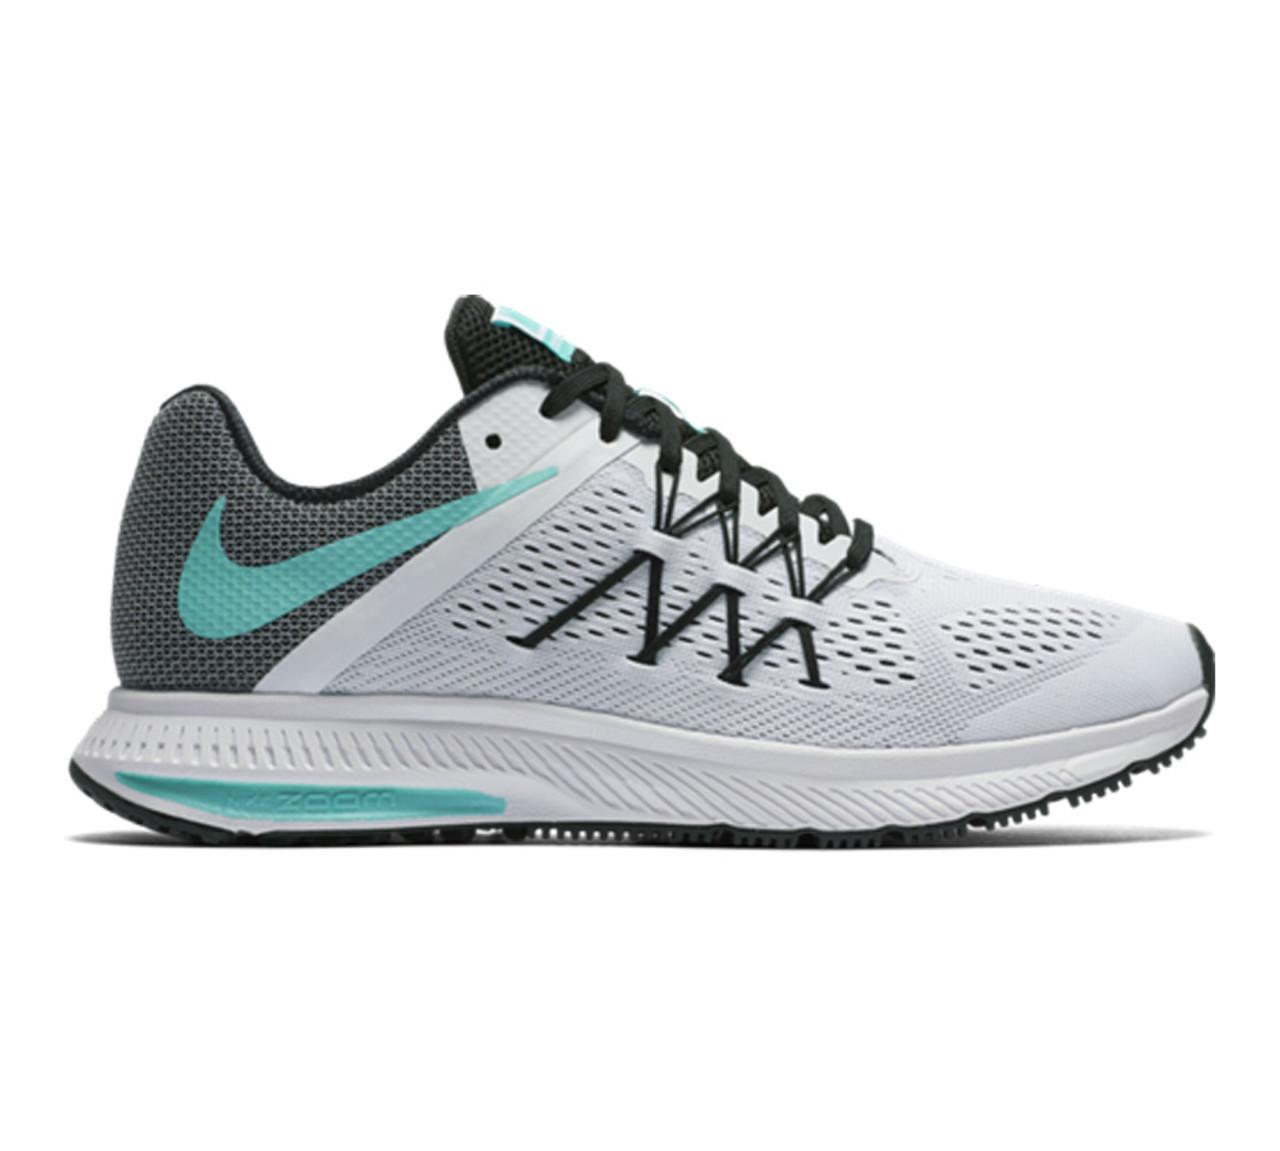 74905ef0c431e Nike Women's Zoom Winflo 3 Running Shoe White/Turquoise